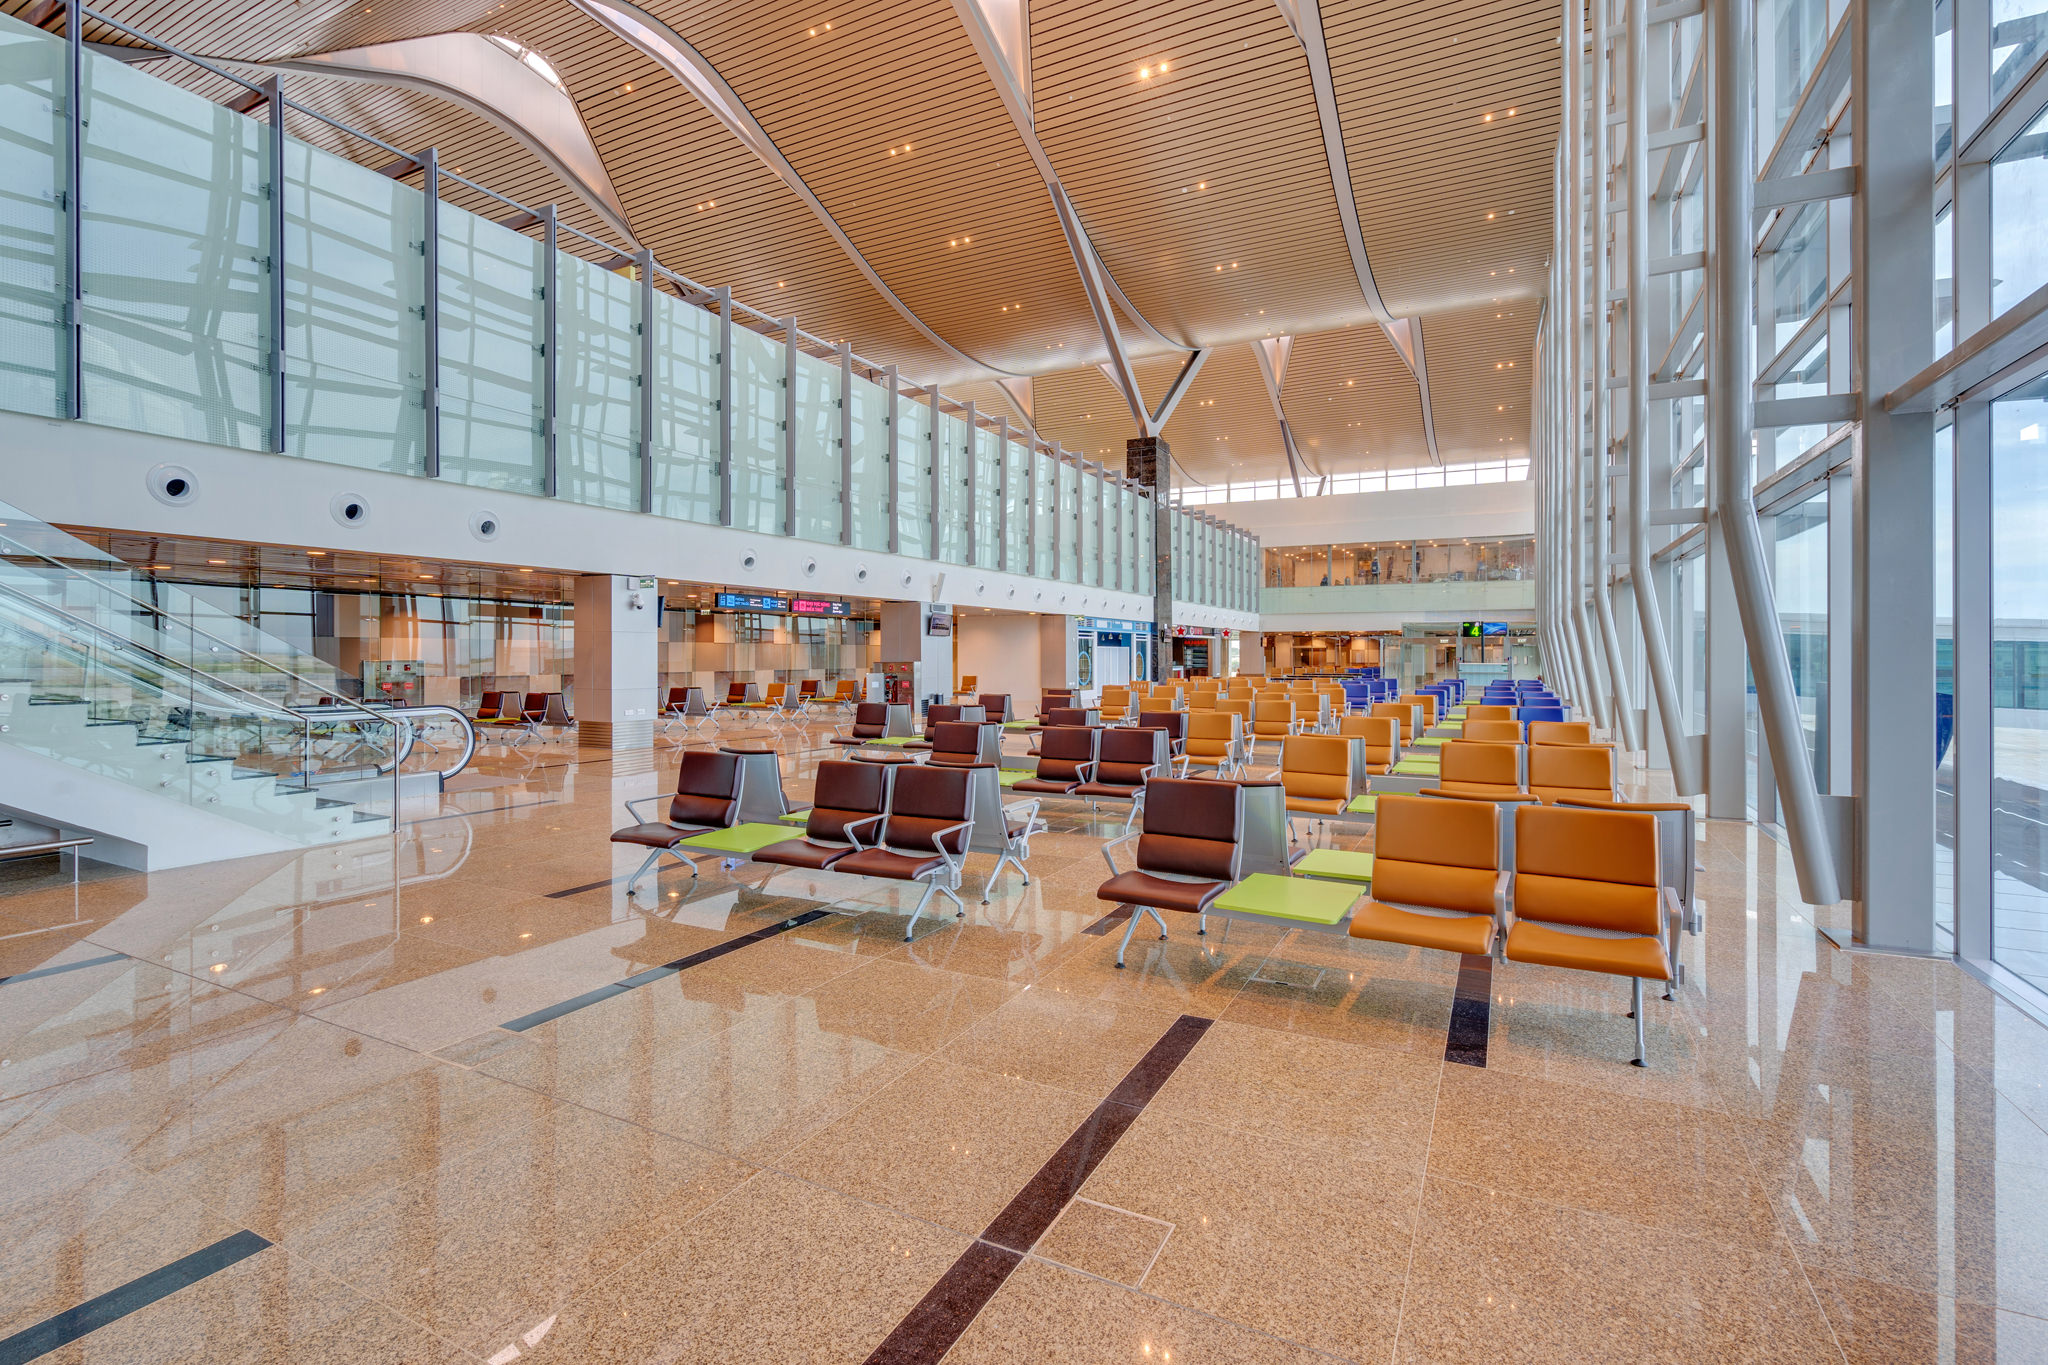 20180626 - Cam Ranh Airport - Architecture - 0353.jpg